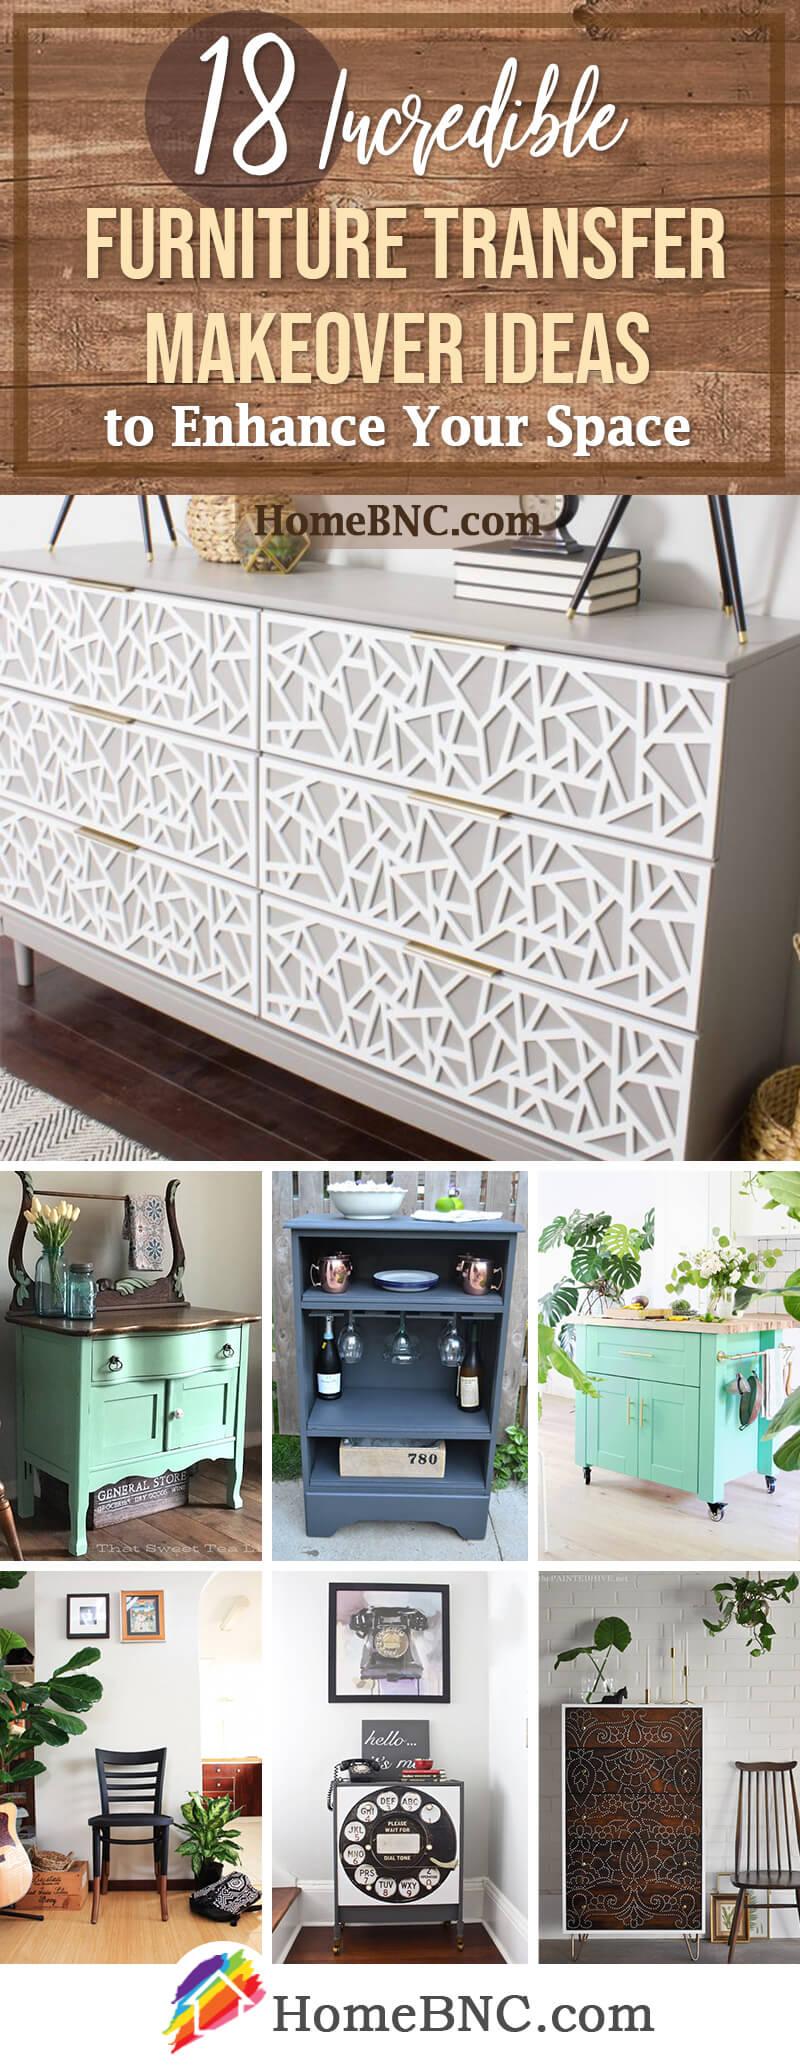 Best Furniture Transfer Makeover Ideas